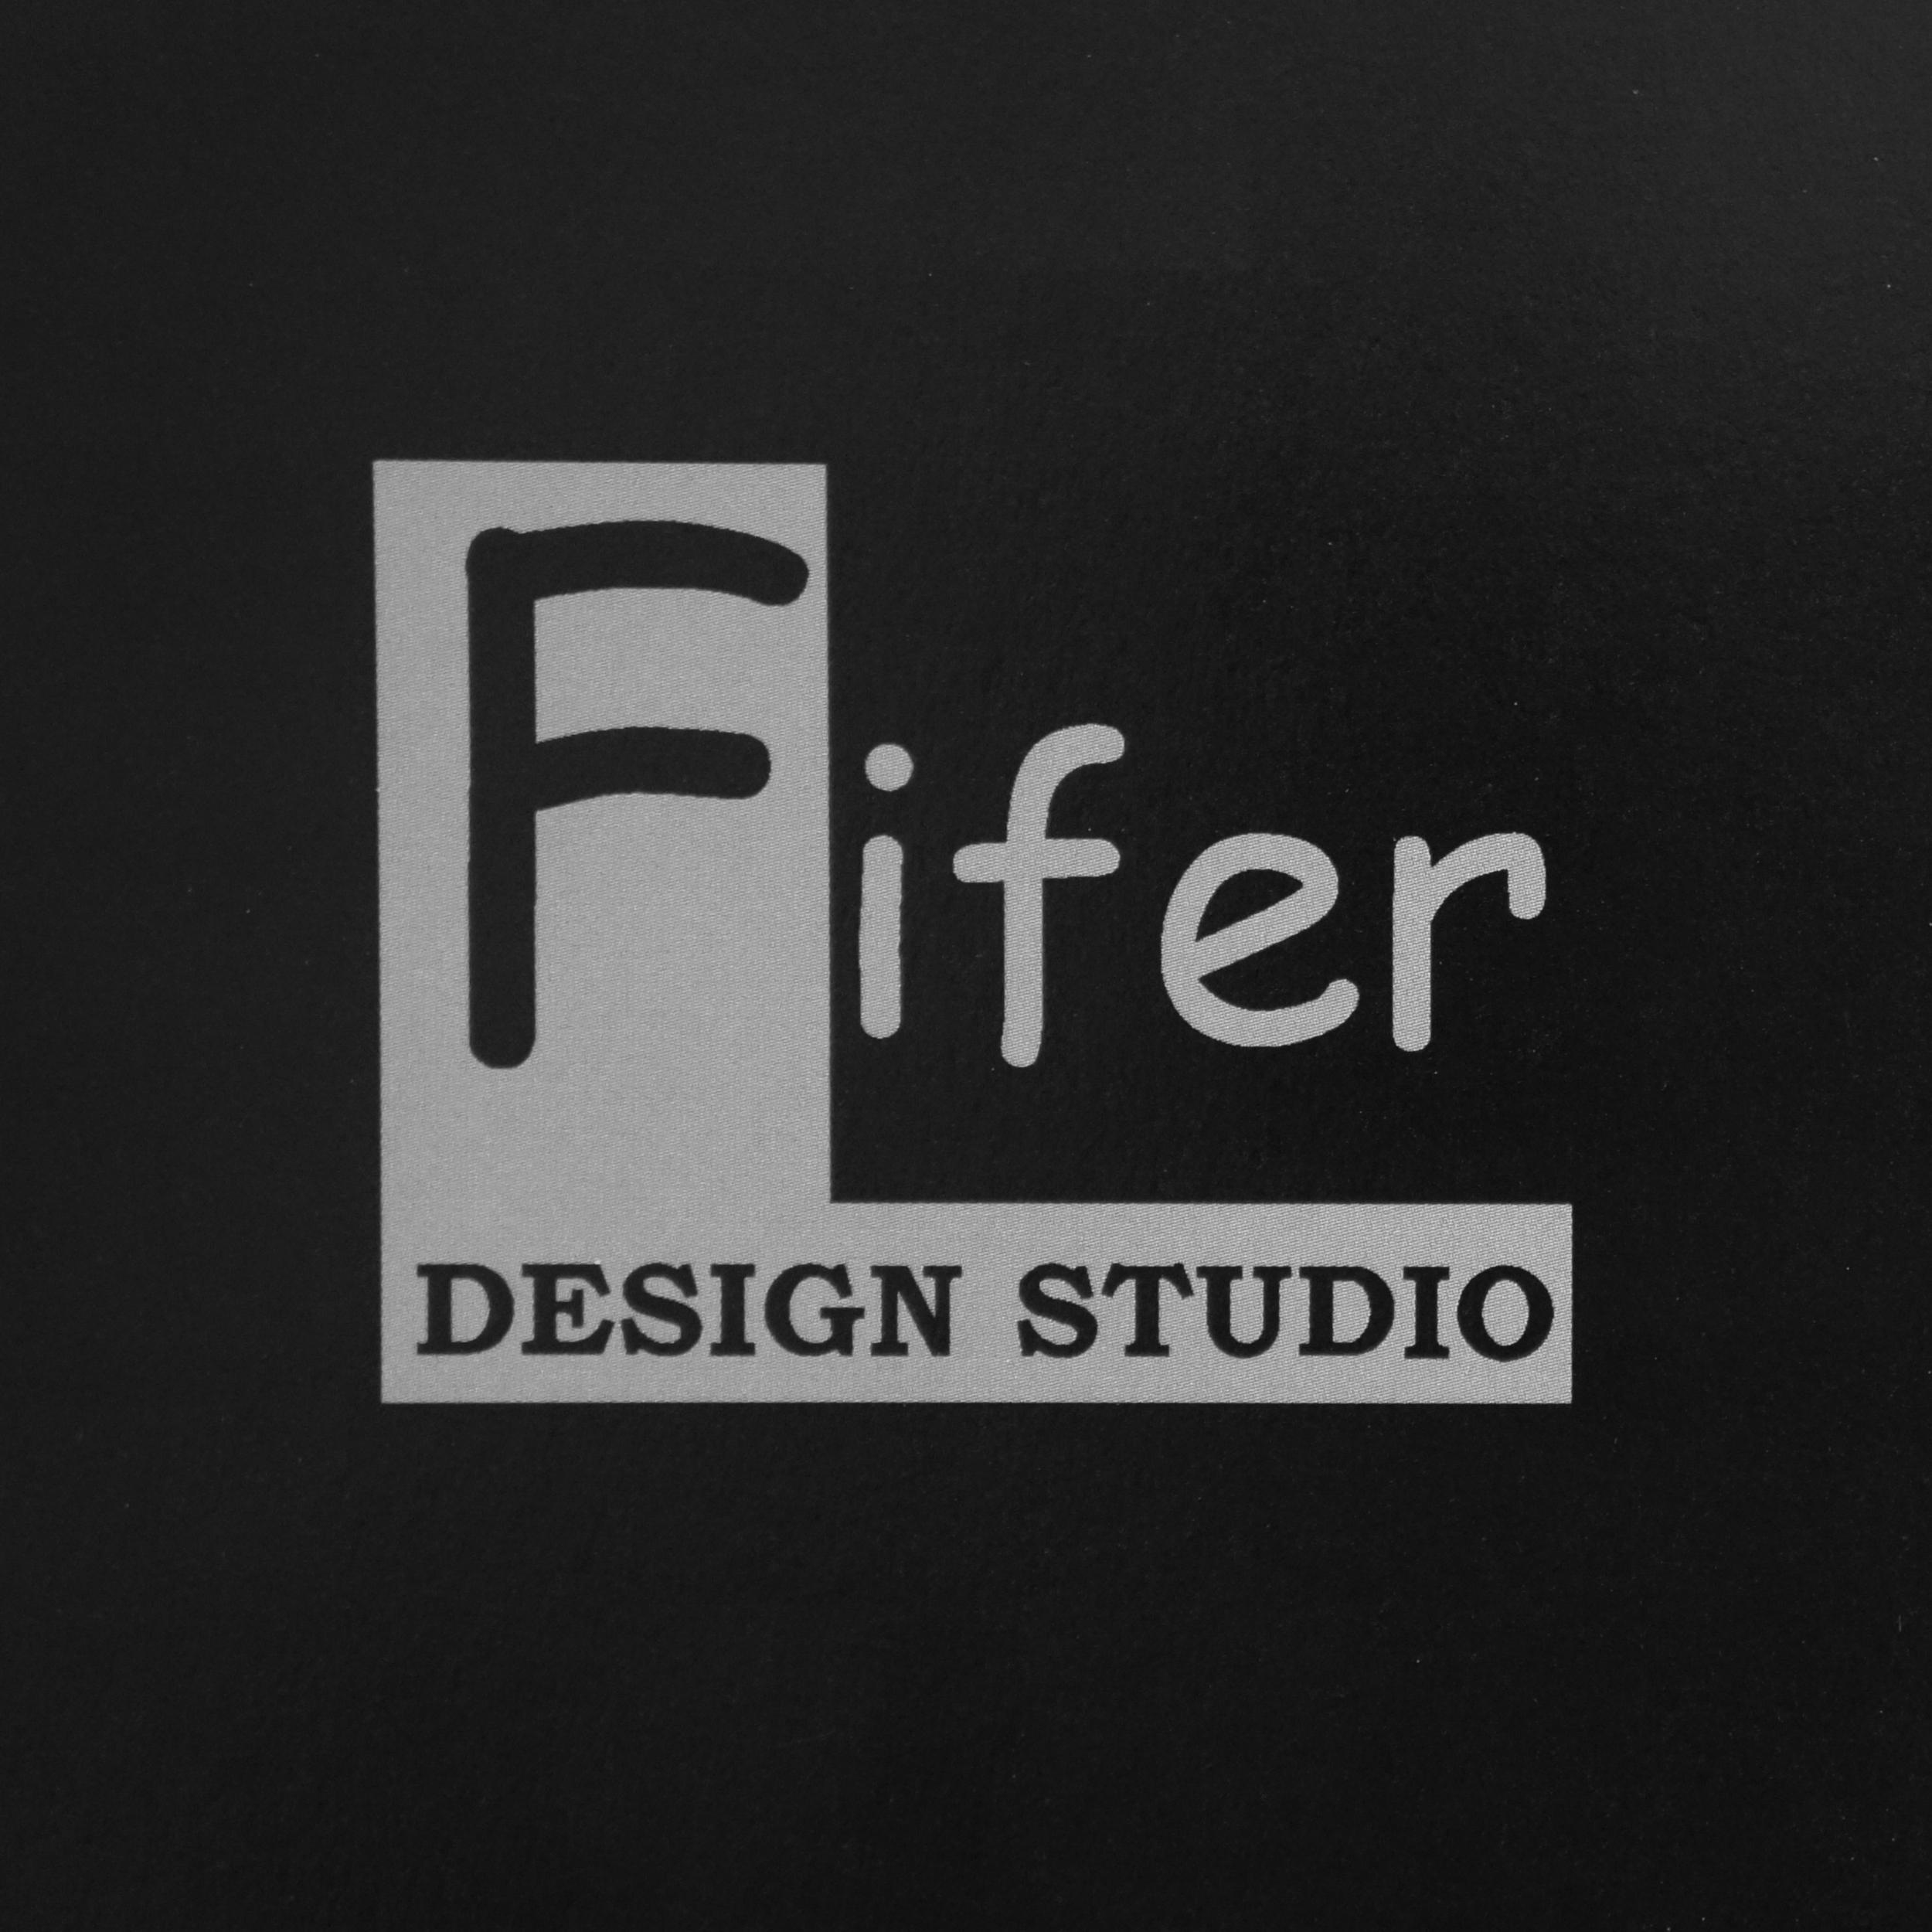 Sommerset_Work_FiferDesignStudio_OldLogo.jpg